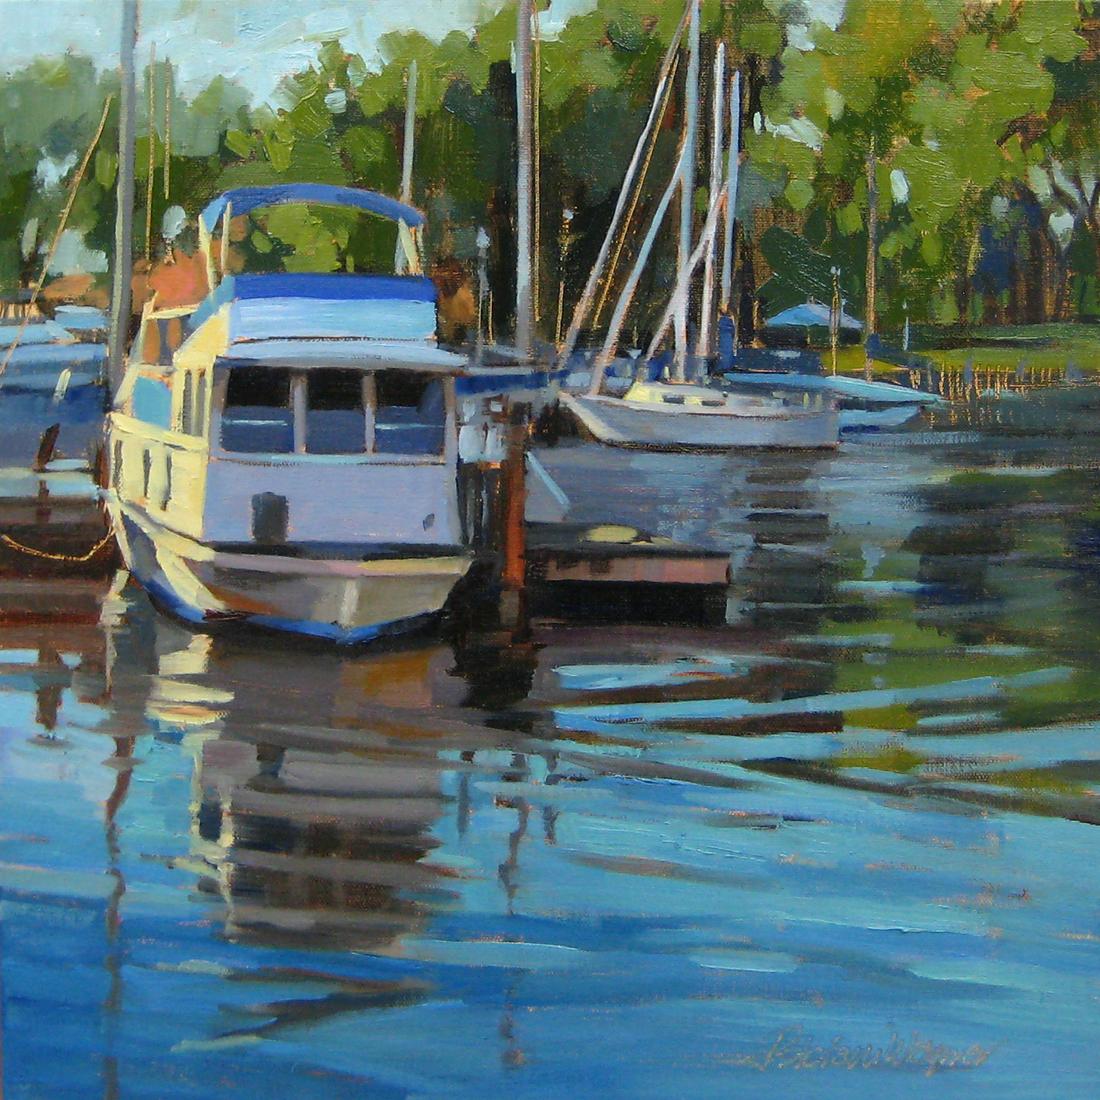 Jill Stefani Wagner - Yacht Club Reflections